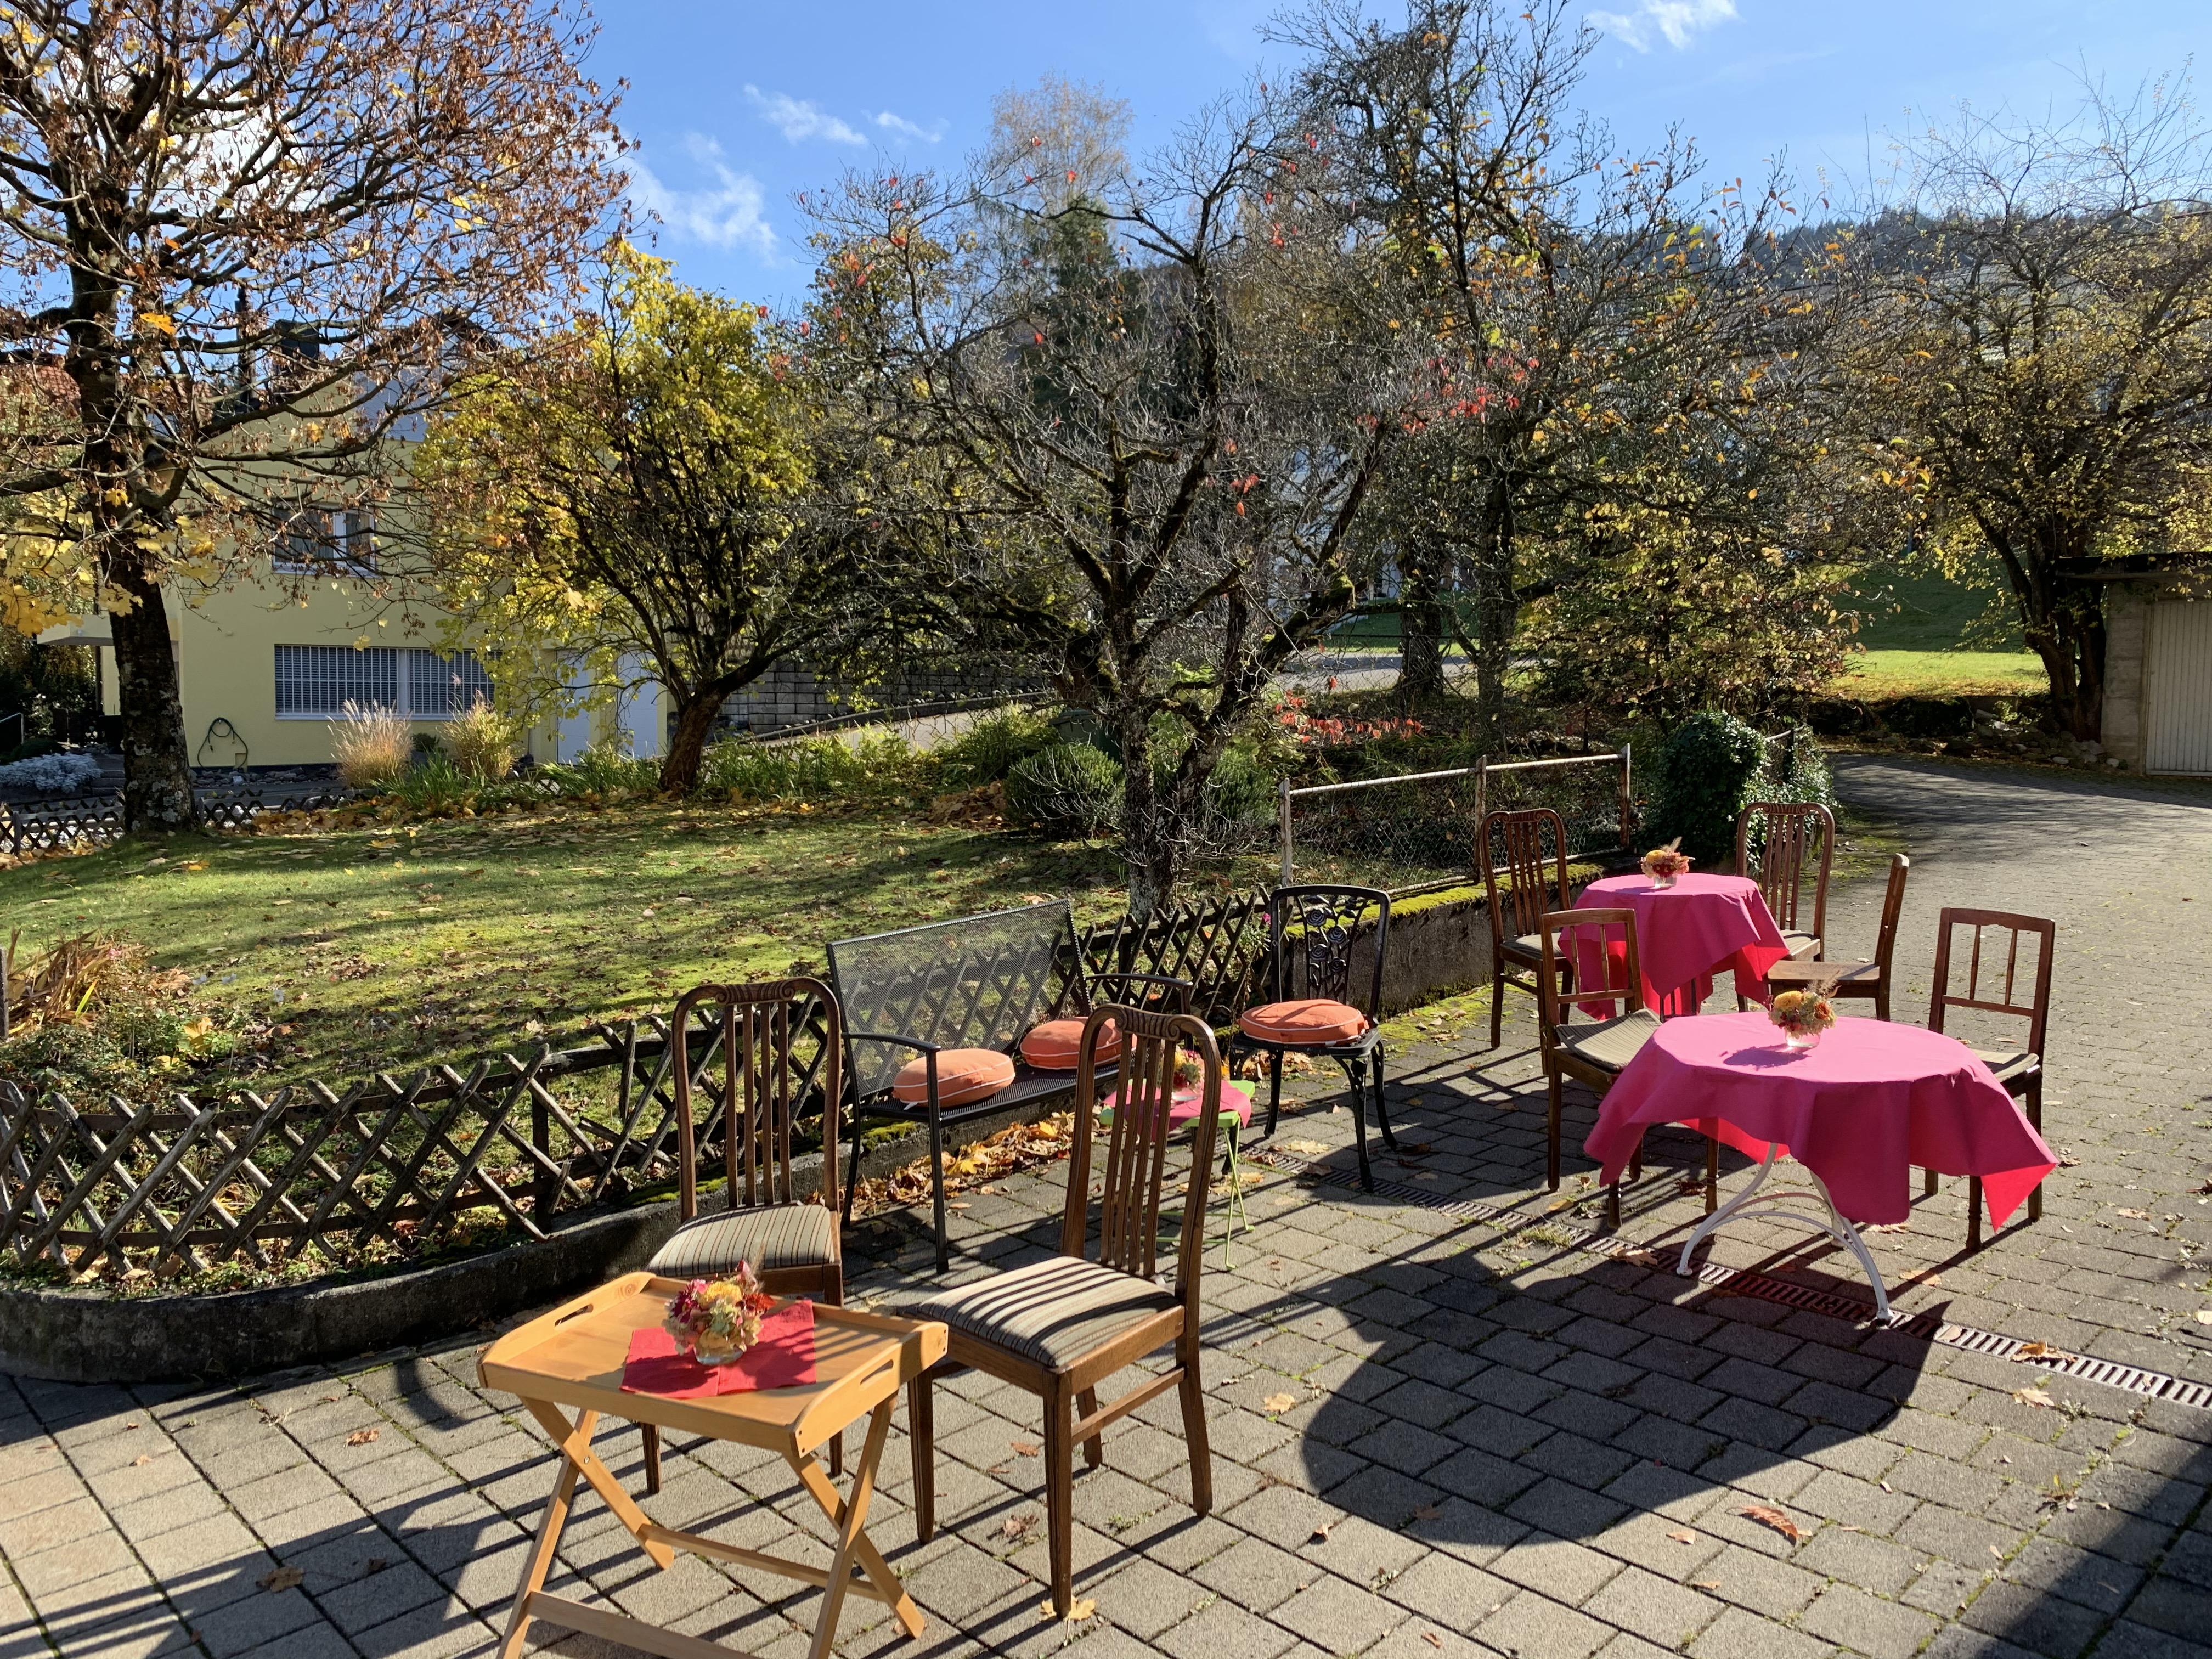 30. & 31.10.2020 Herbstgestecke & Café